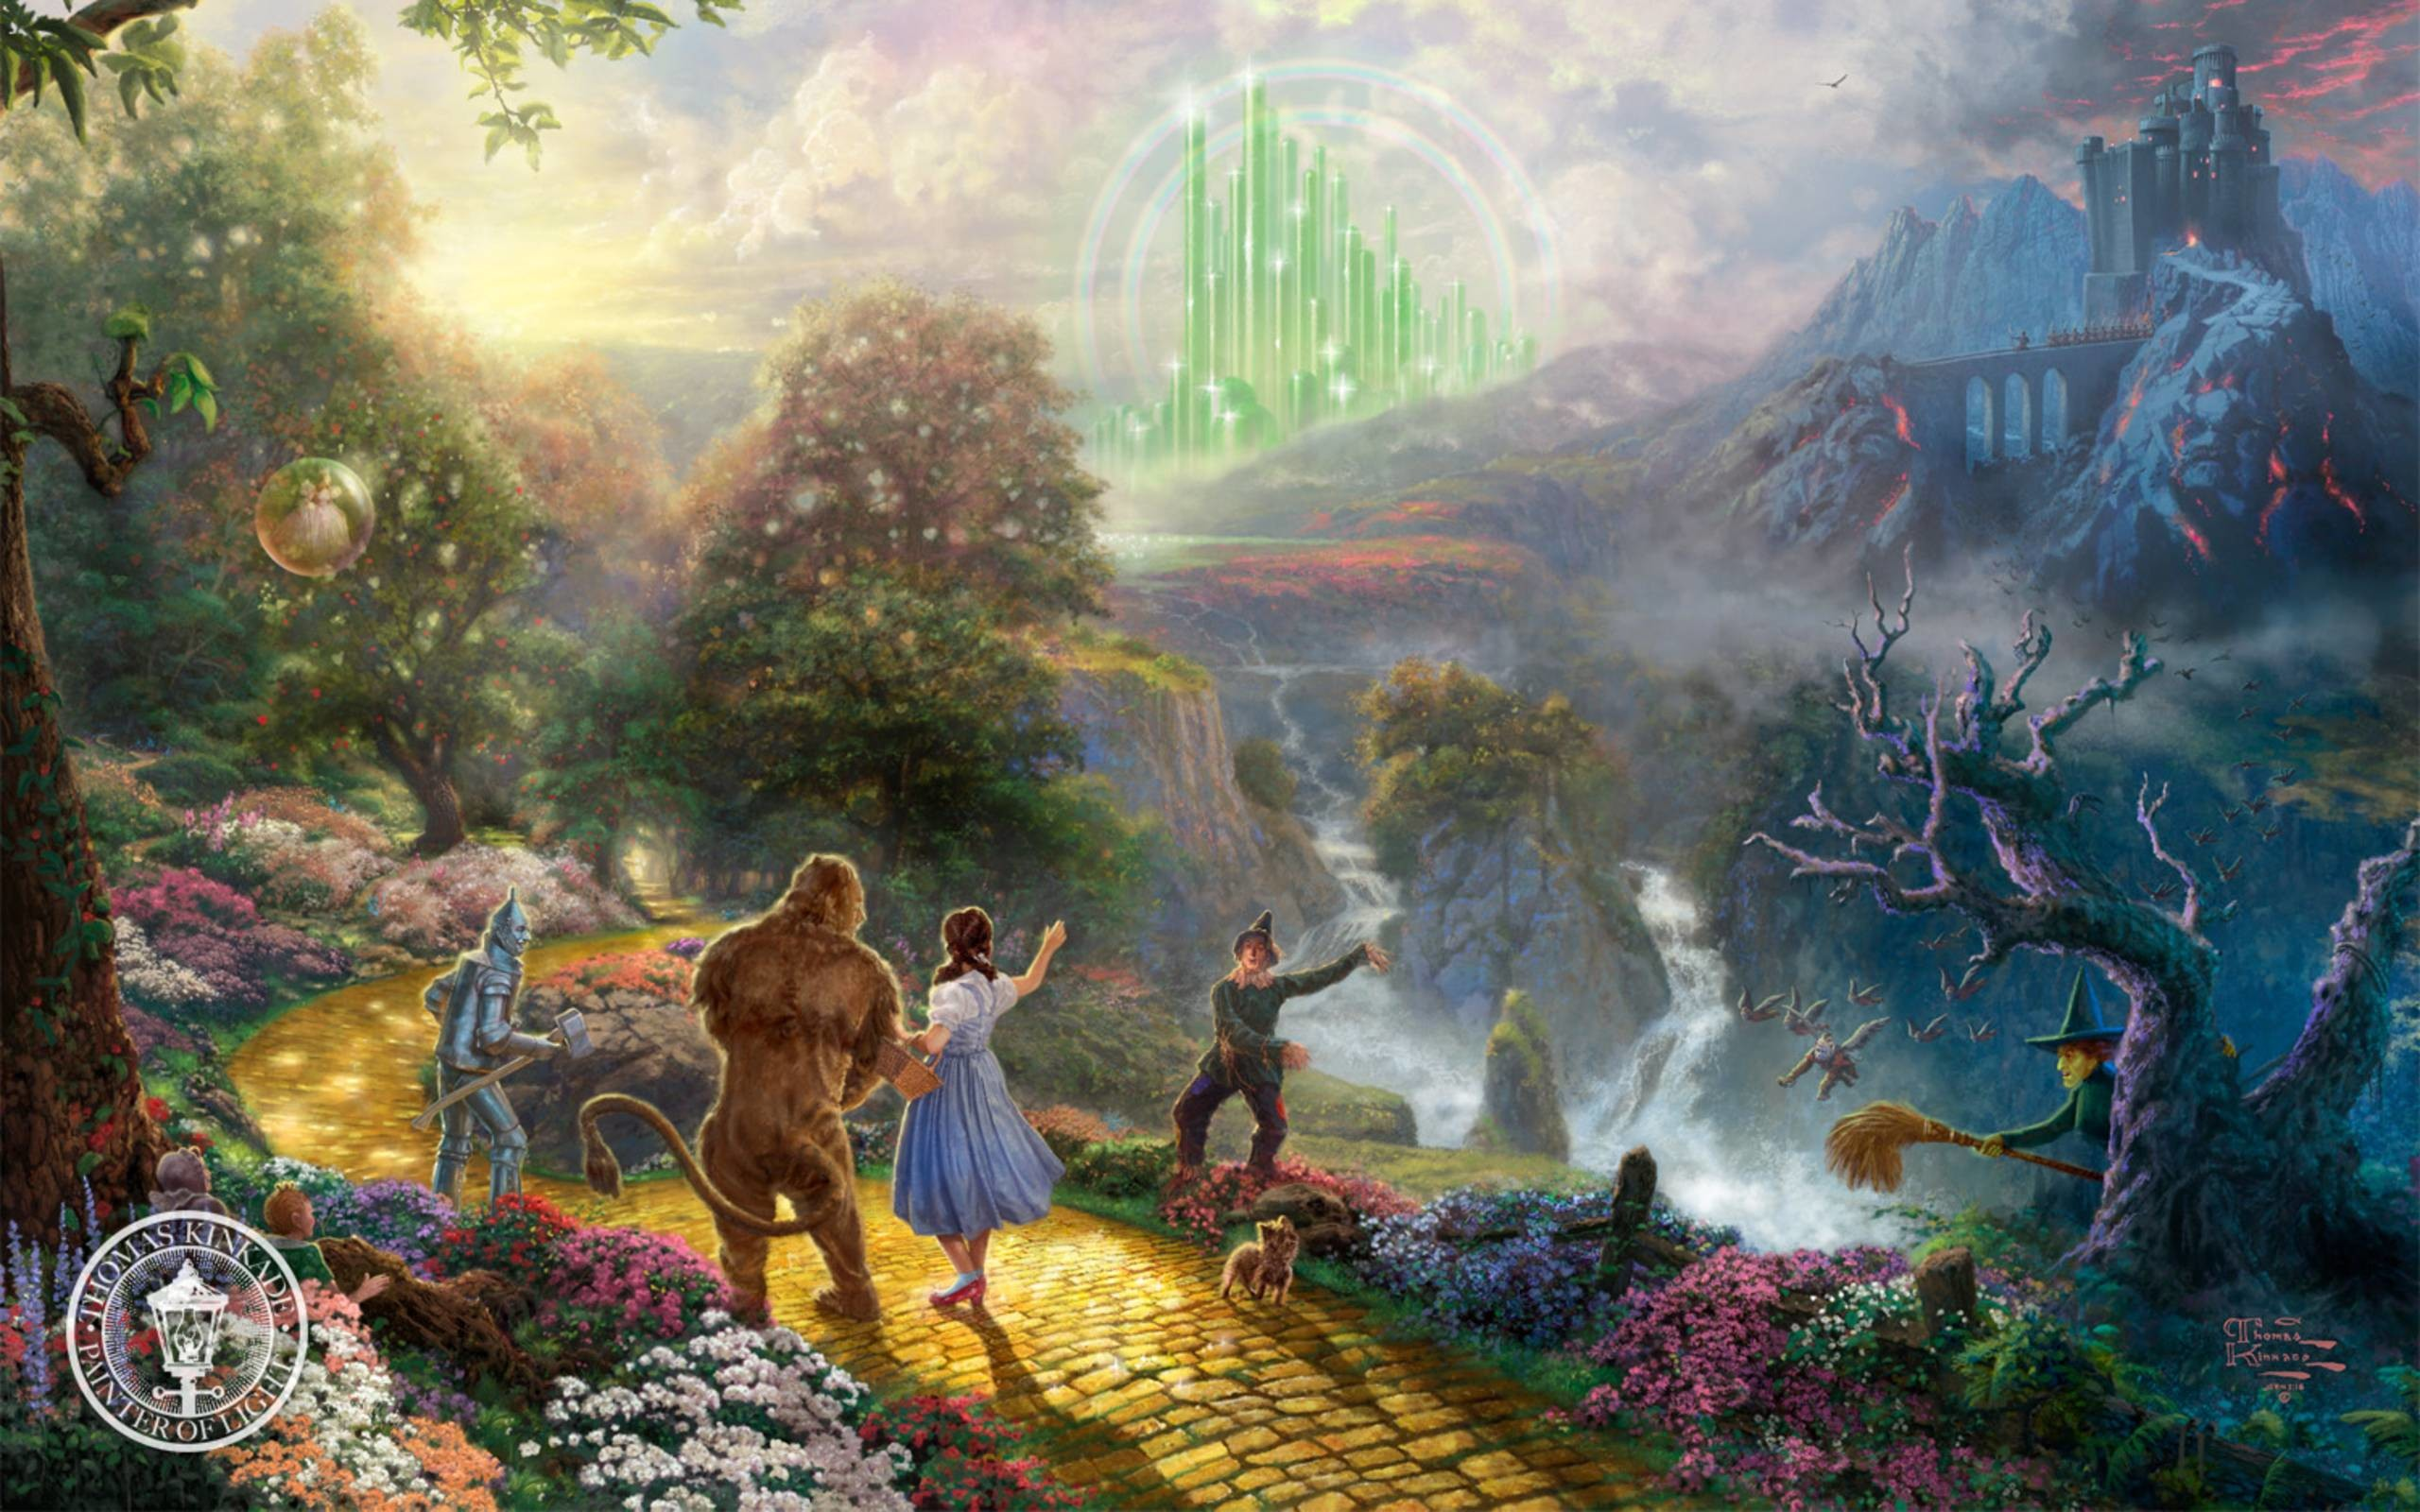 Most Inspiring Wallpaper Macbook Disney - 790973-new-thomas-kinkade-computer-wallpaper-2560x1600-macbook  Gallery_543225.jpg